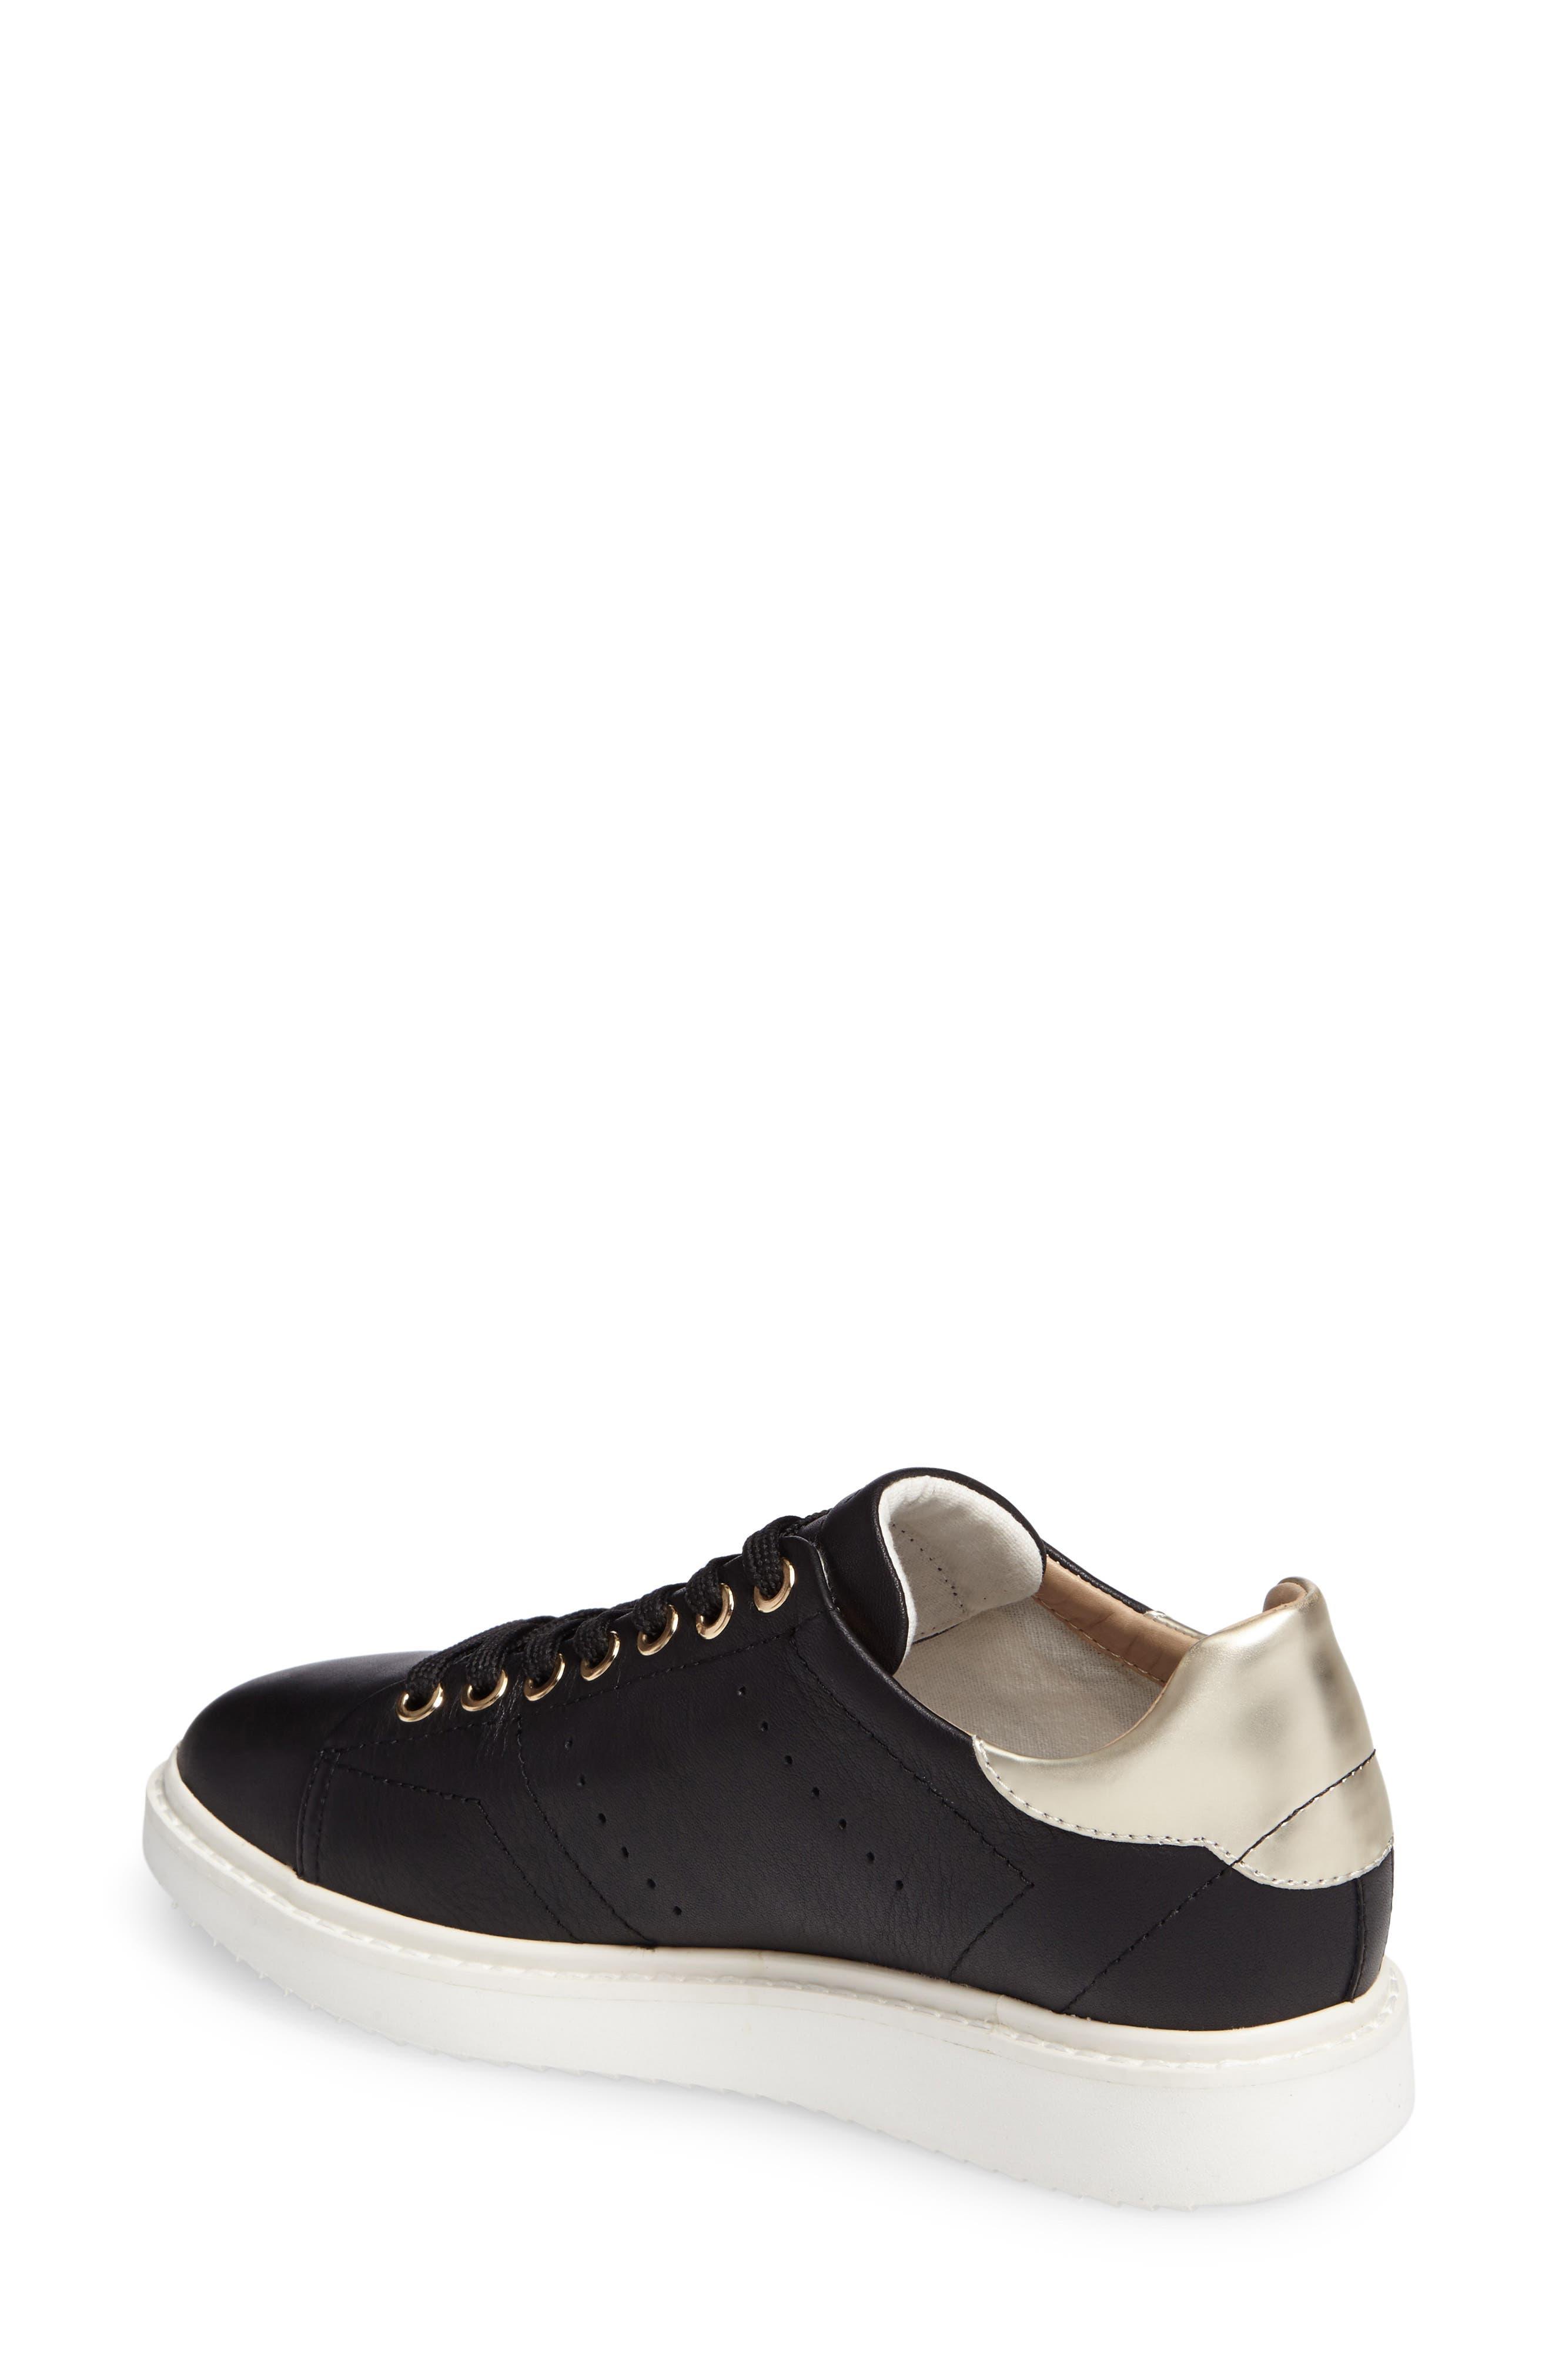 Thymar Sneaker,                             Alternate thumbnail 2, color,                             Black Leather